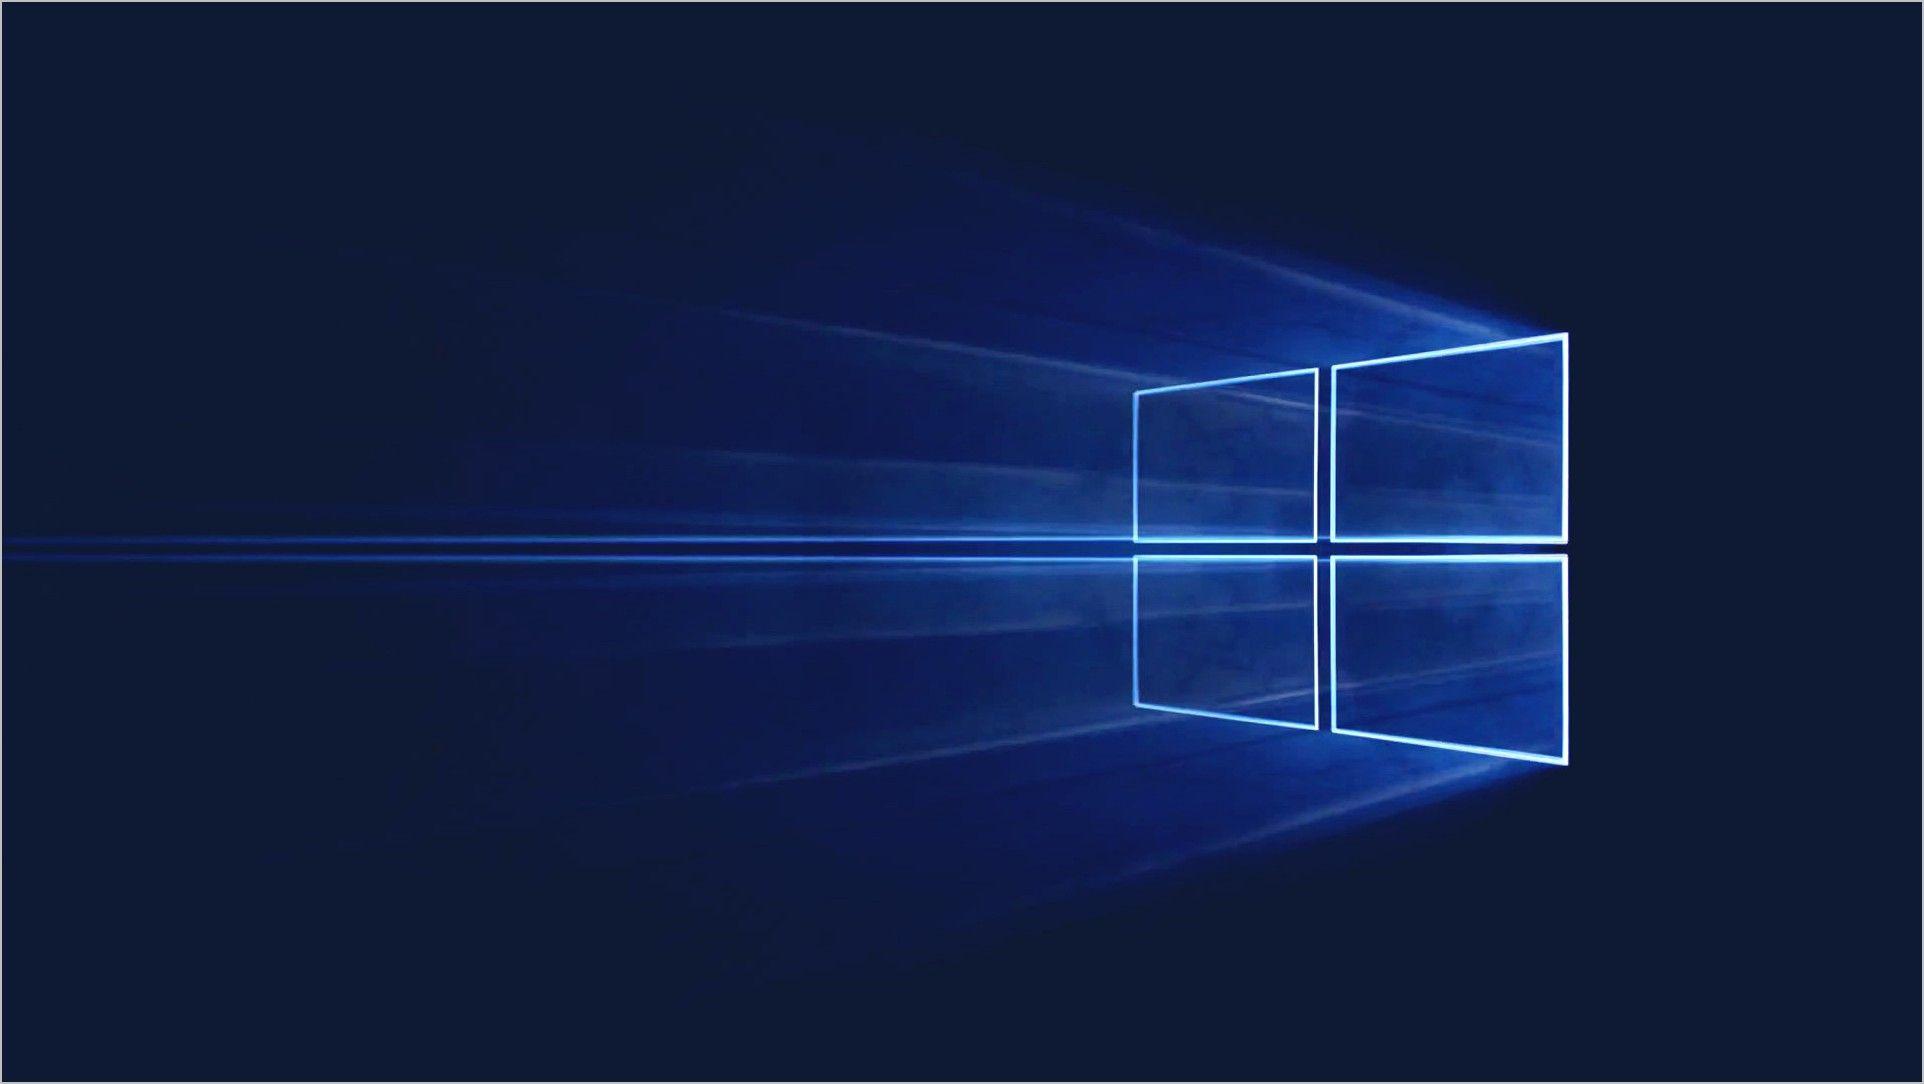 Dark Theme Wallpaper 4k Stocks Hd Wallpapers For Laptop Windows 10 Desktop Backgrounds Wallpaper Windows 10